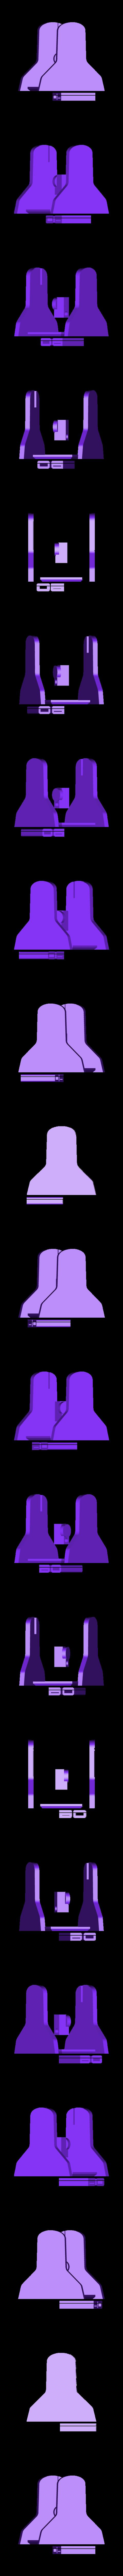 R1_black.STL Download free STL file Multi-Color Robo R1 USB Holder • 3D print model, MosaicManufacturing